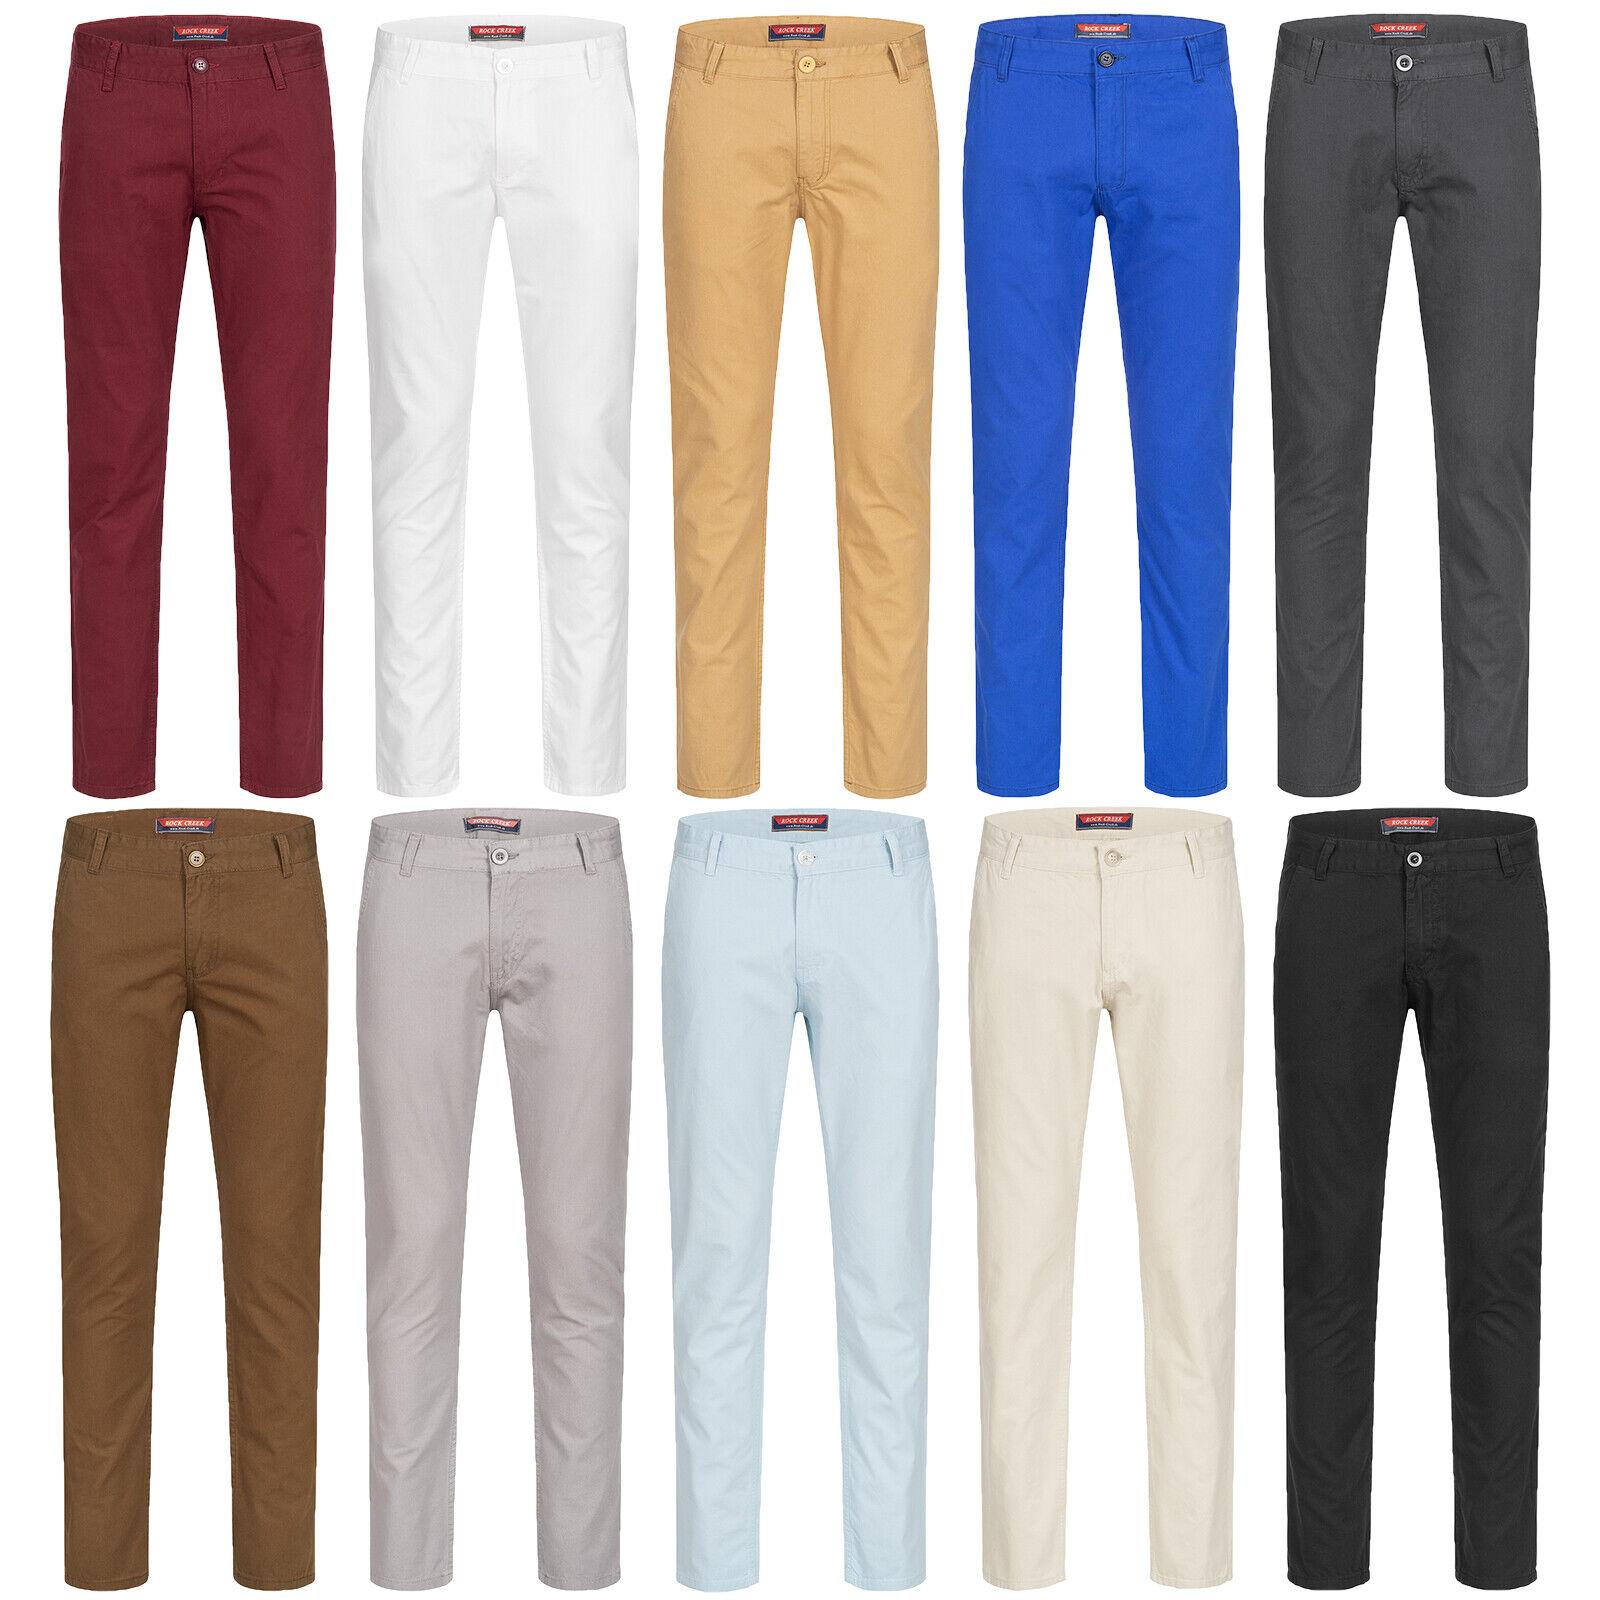 95b2bb0290f313 ... Stretch Hose Jogg Jeans Sweatpants Sweathose 7001. Rock Creek Herren  Chino Stoff Hose Regular Fit Designer Chinohose RC-2083